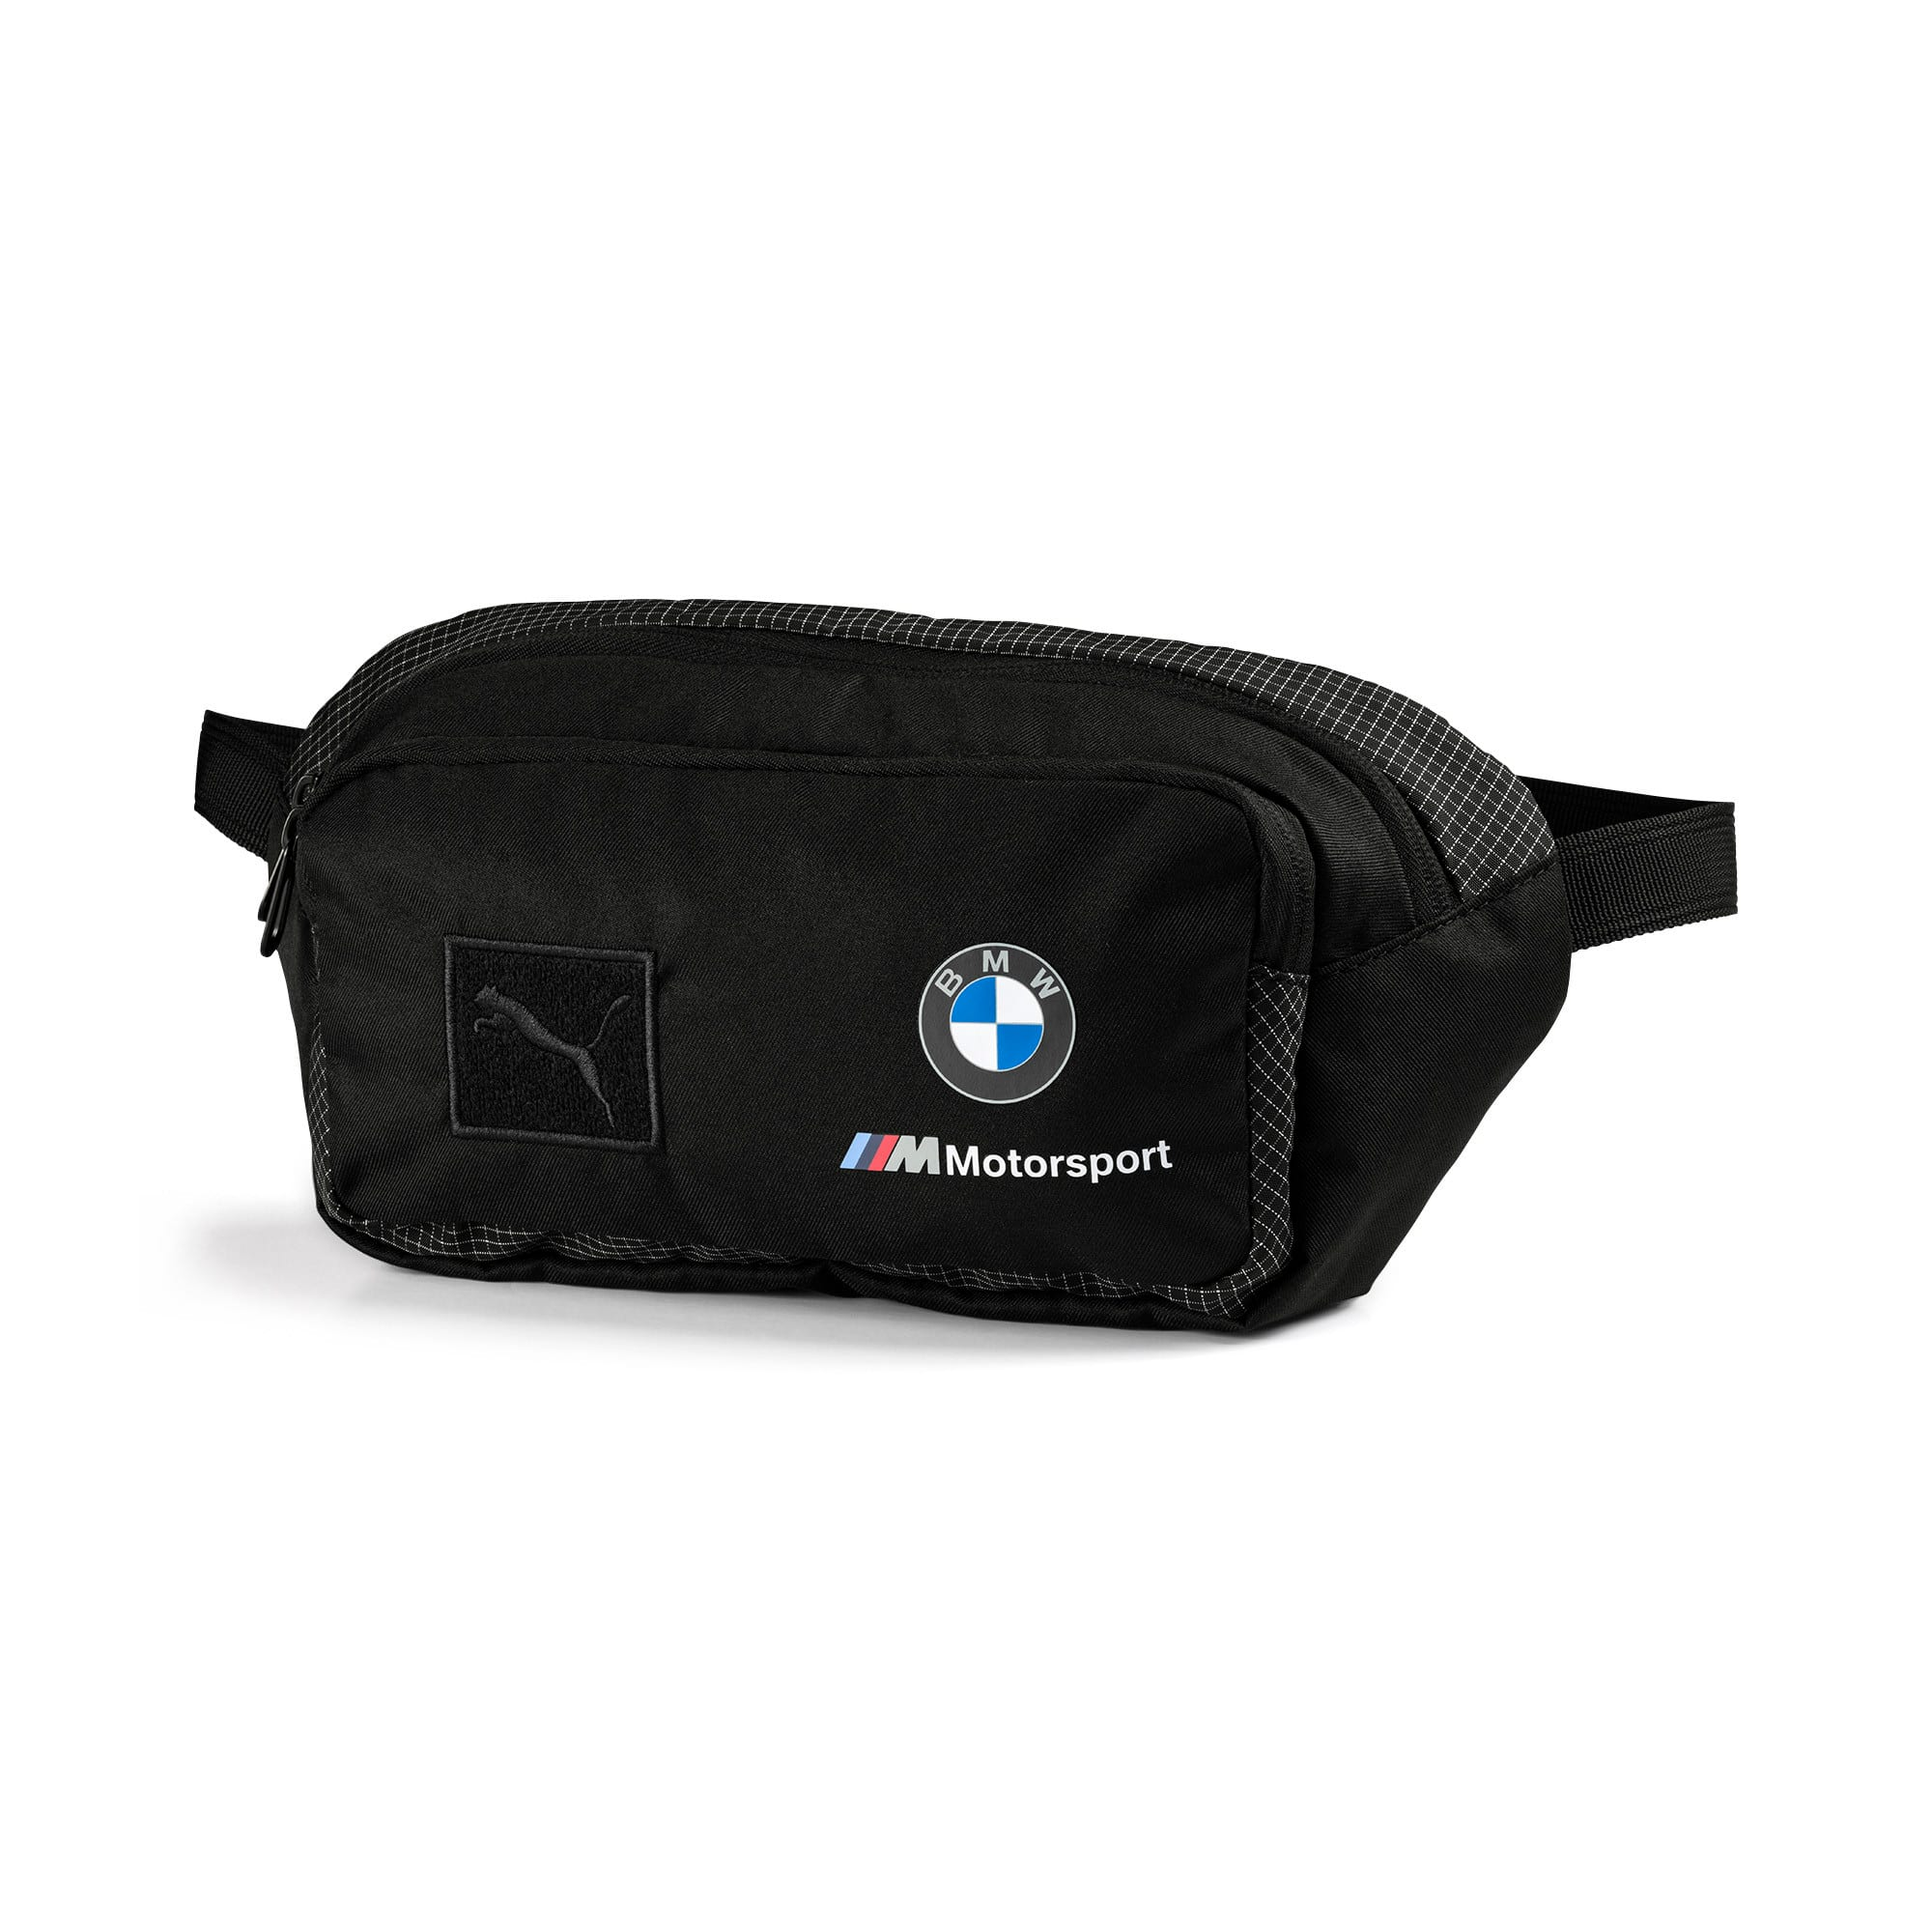 Thumbnail 1 of BMW M Motorsport Waist Bag, Puma Black, medium-IND